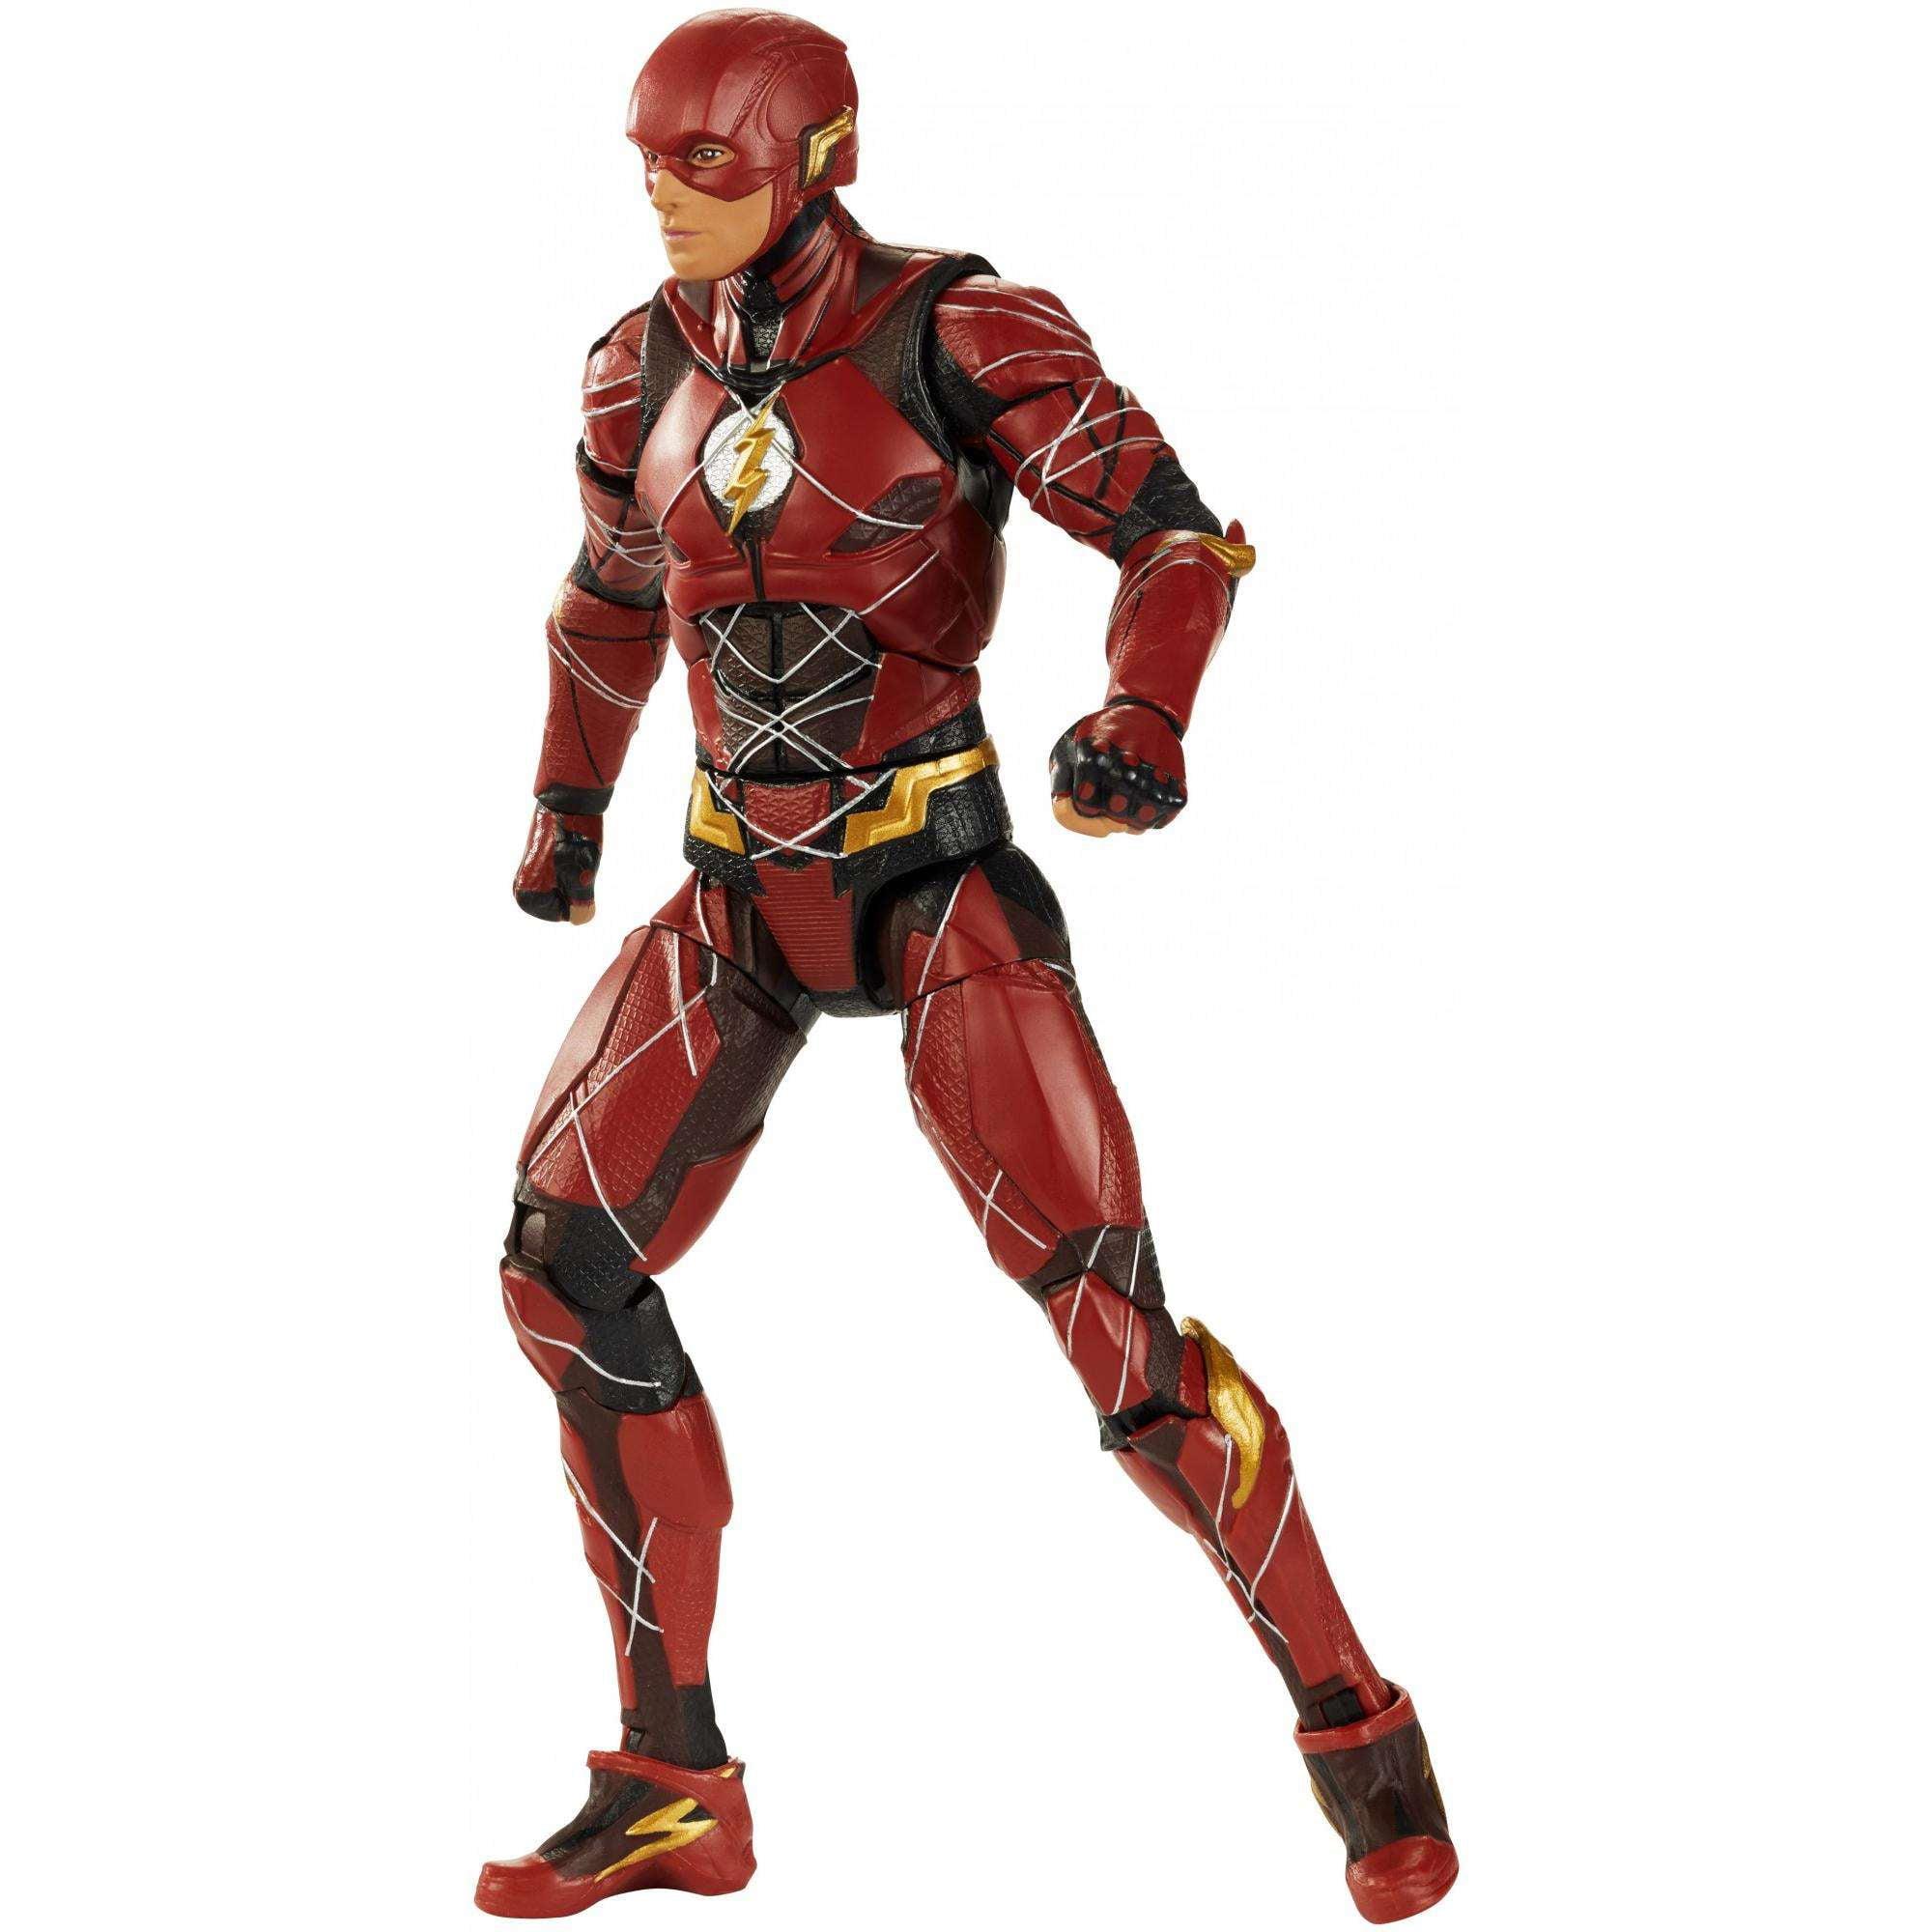 DC Comics Multiverse Justice League The Flash by Mattel